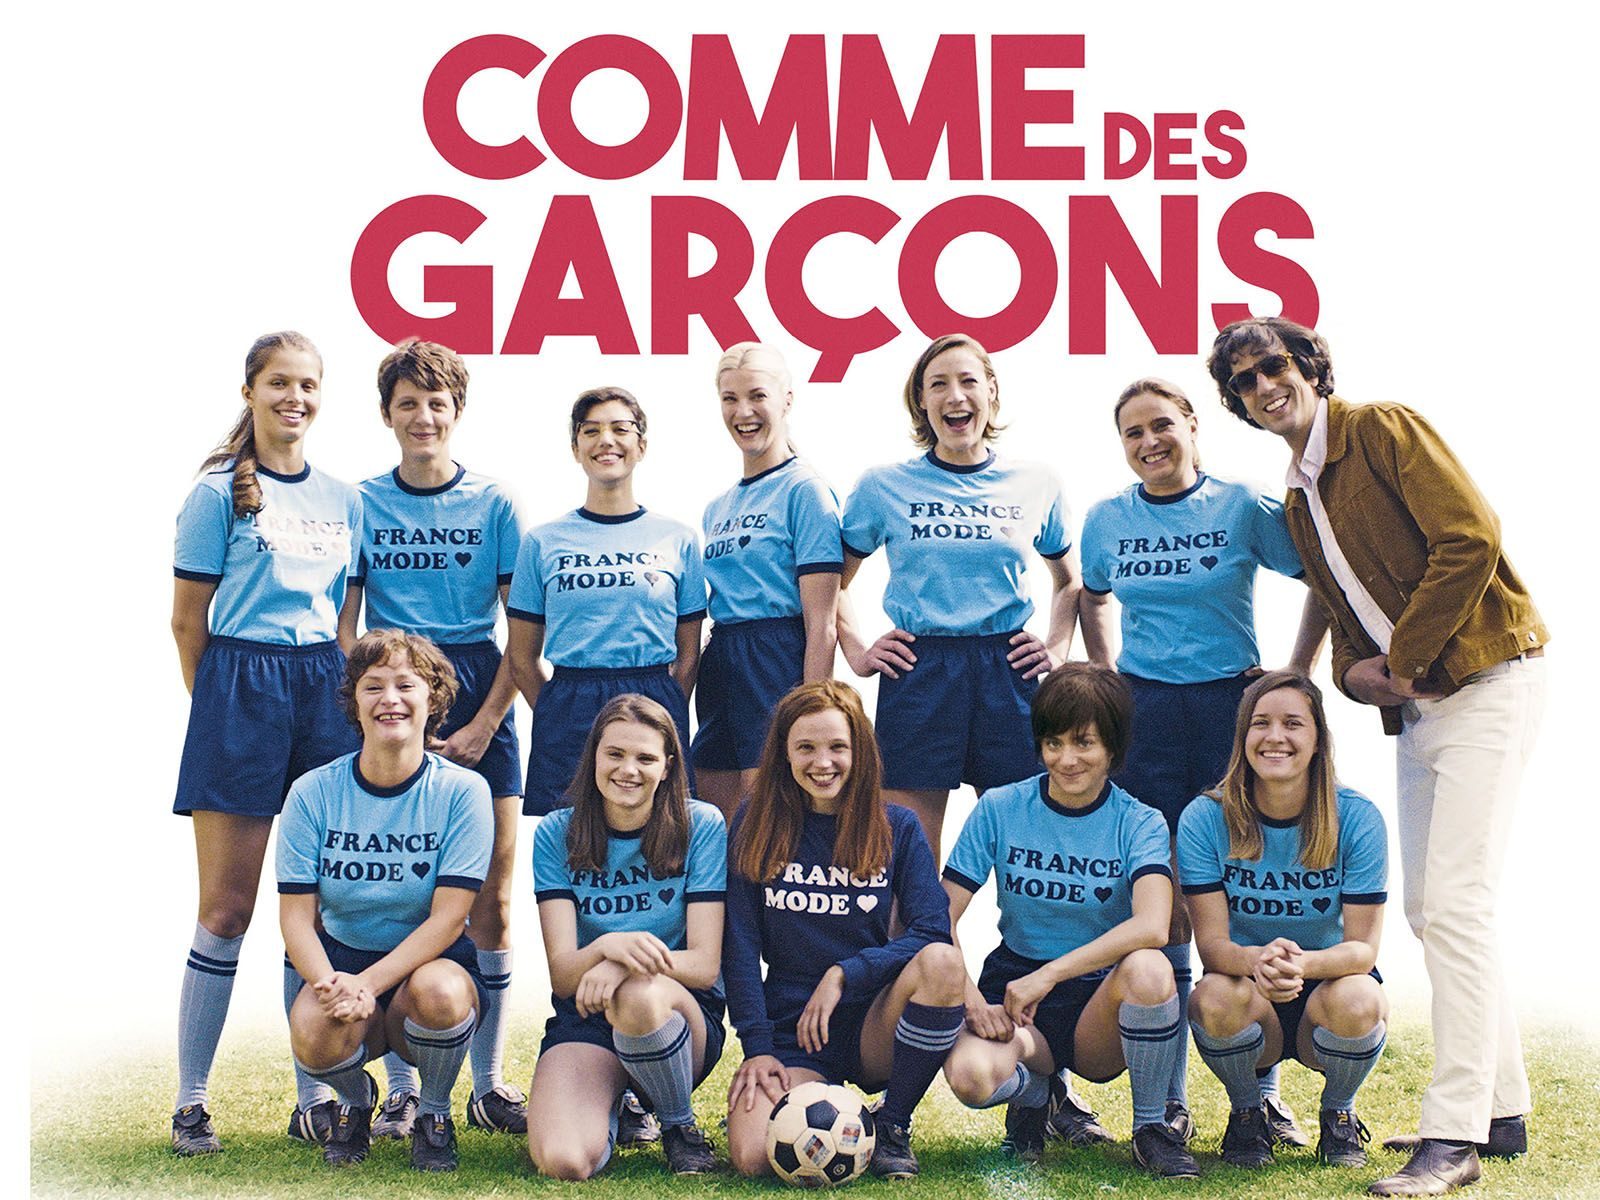 Épinglé par Cristina Ibrahimovic sur Paris Saint Germain